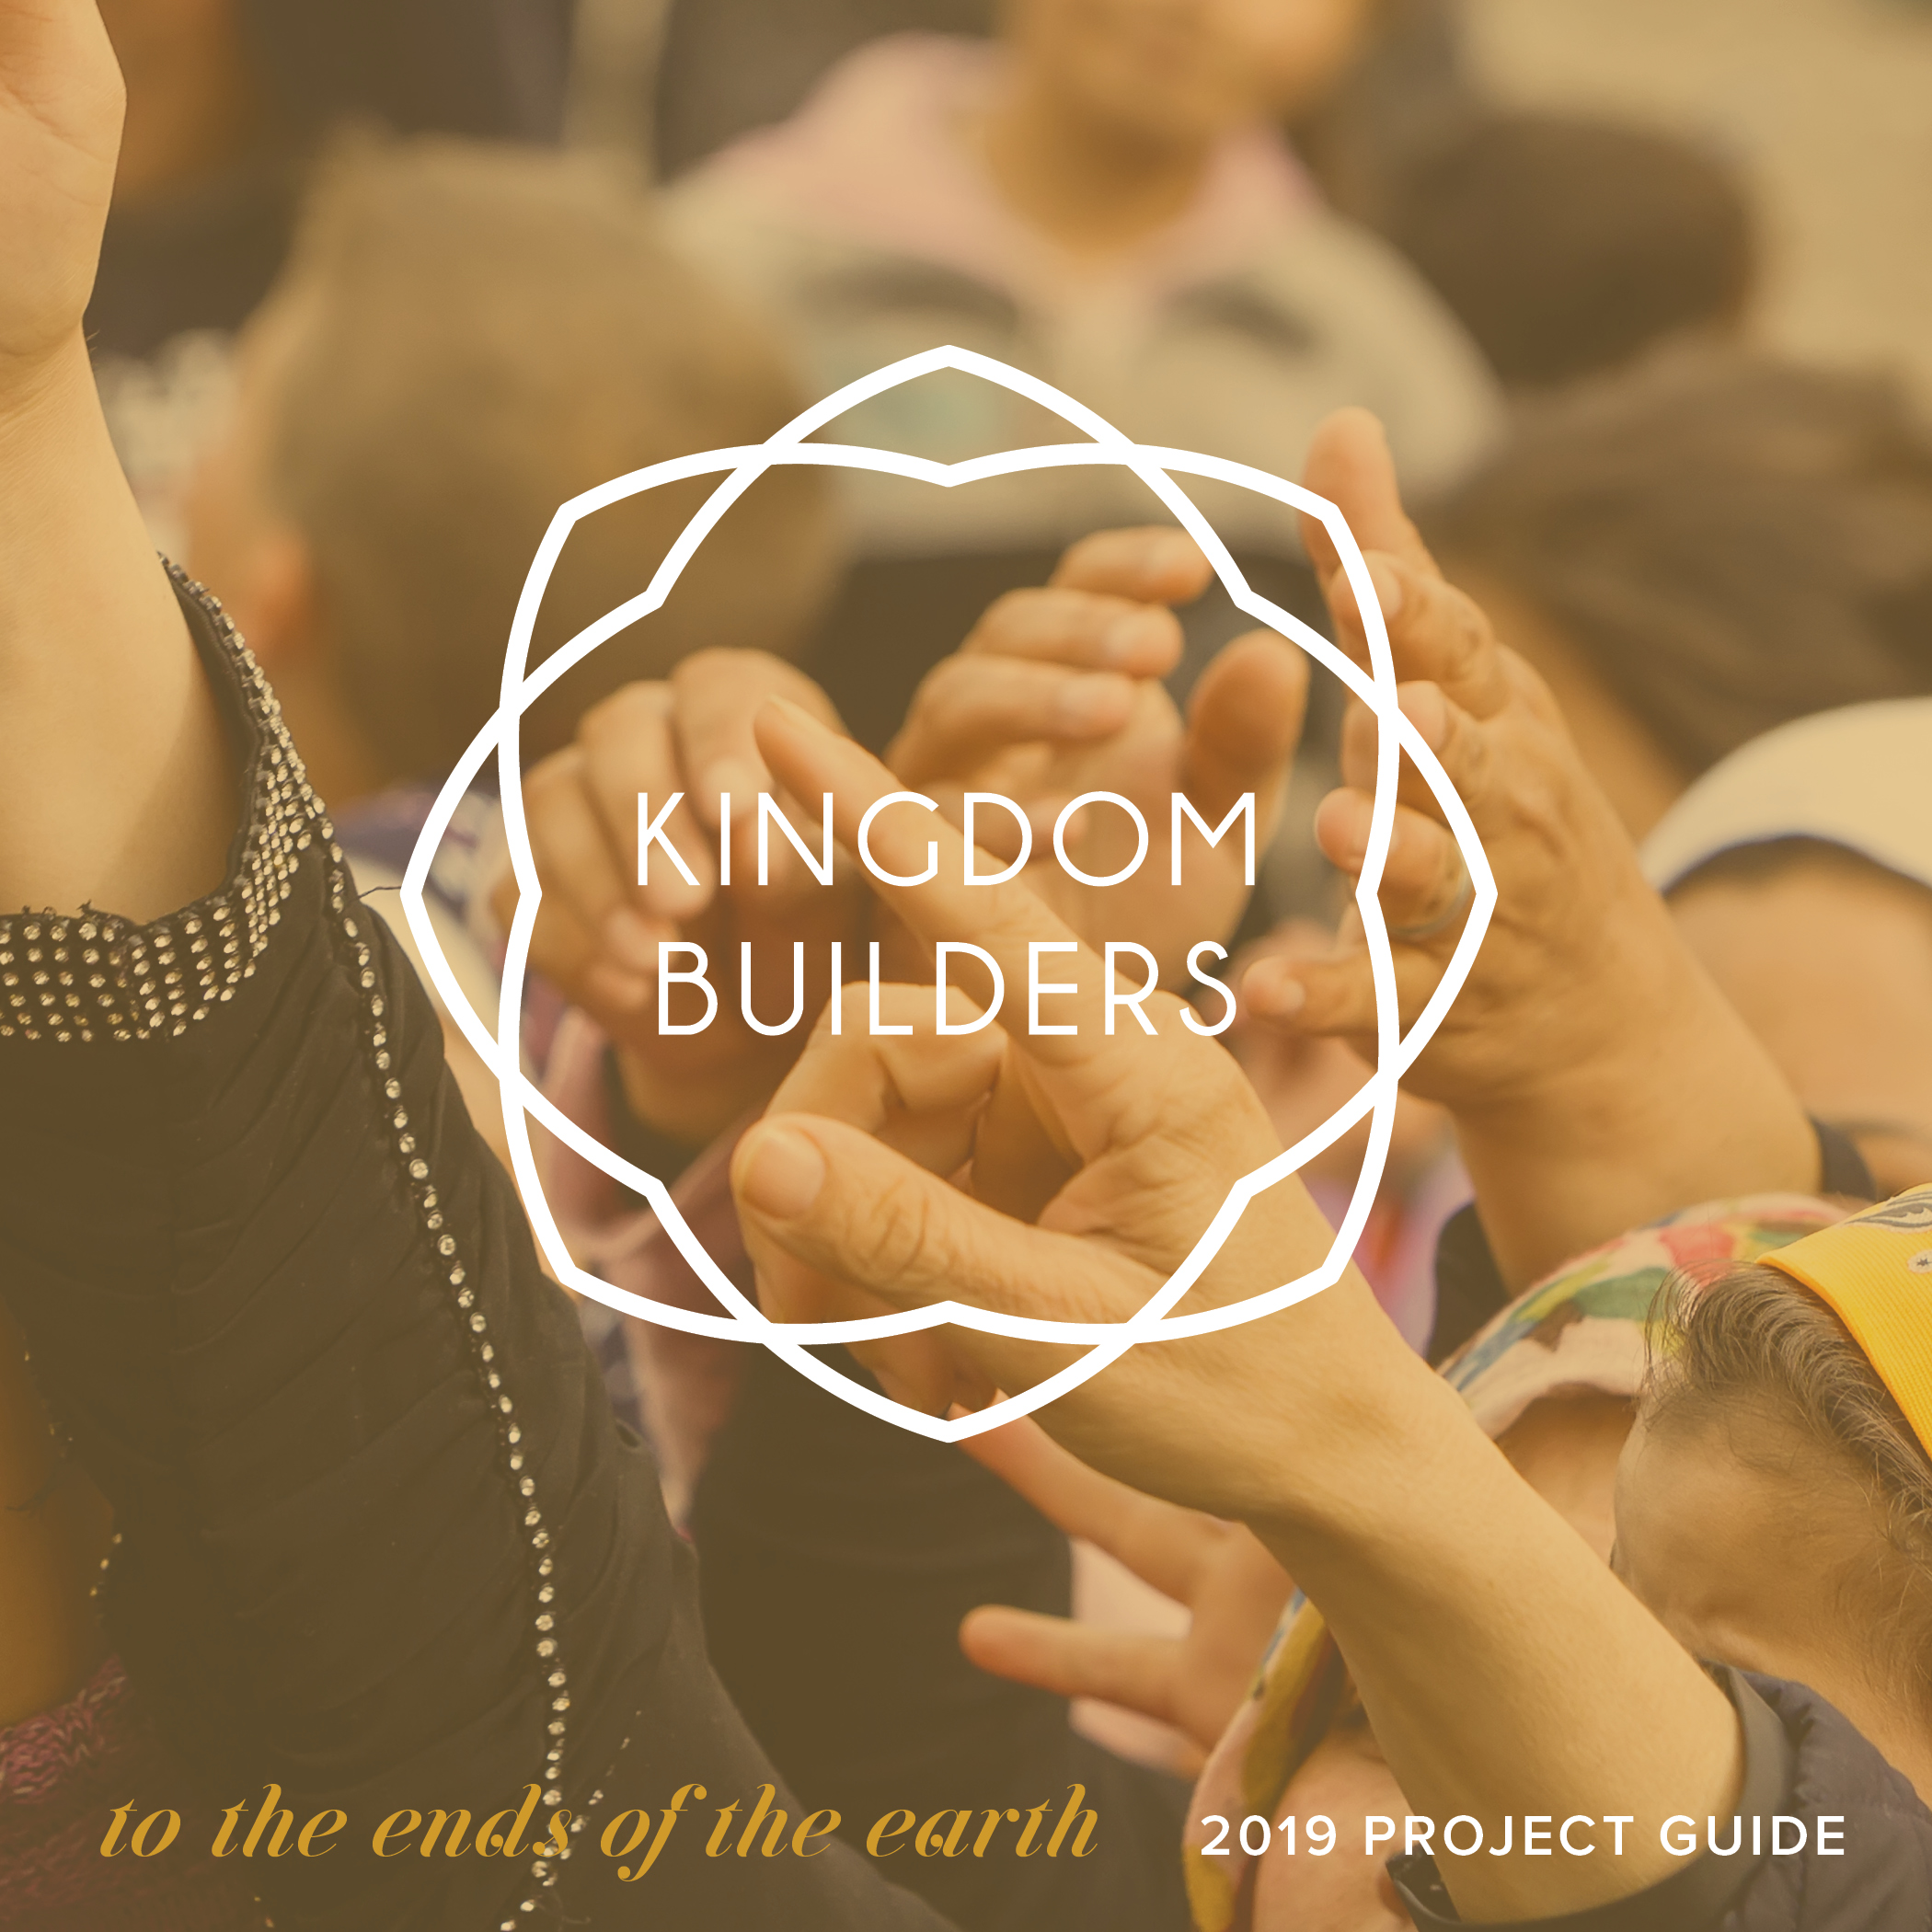 Kingdom Builders 2019 Project Guide.jpg